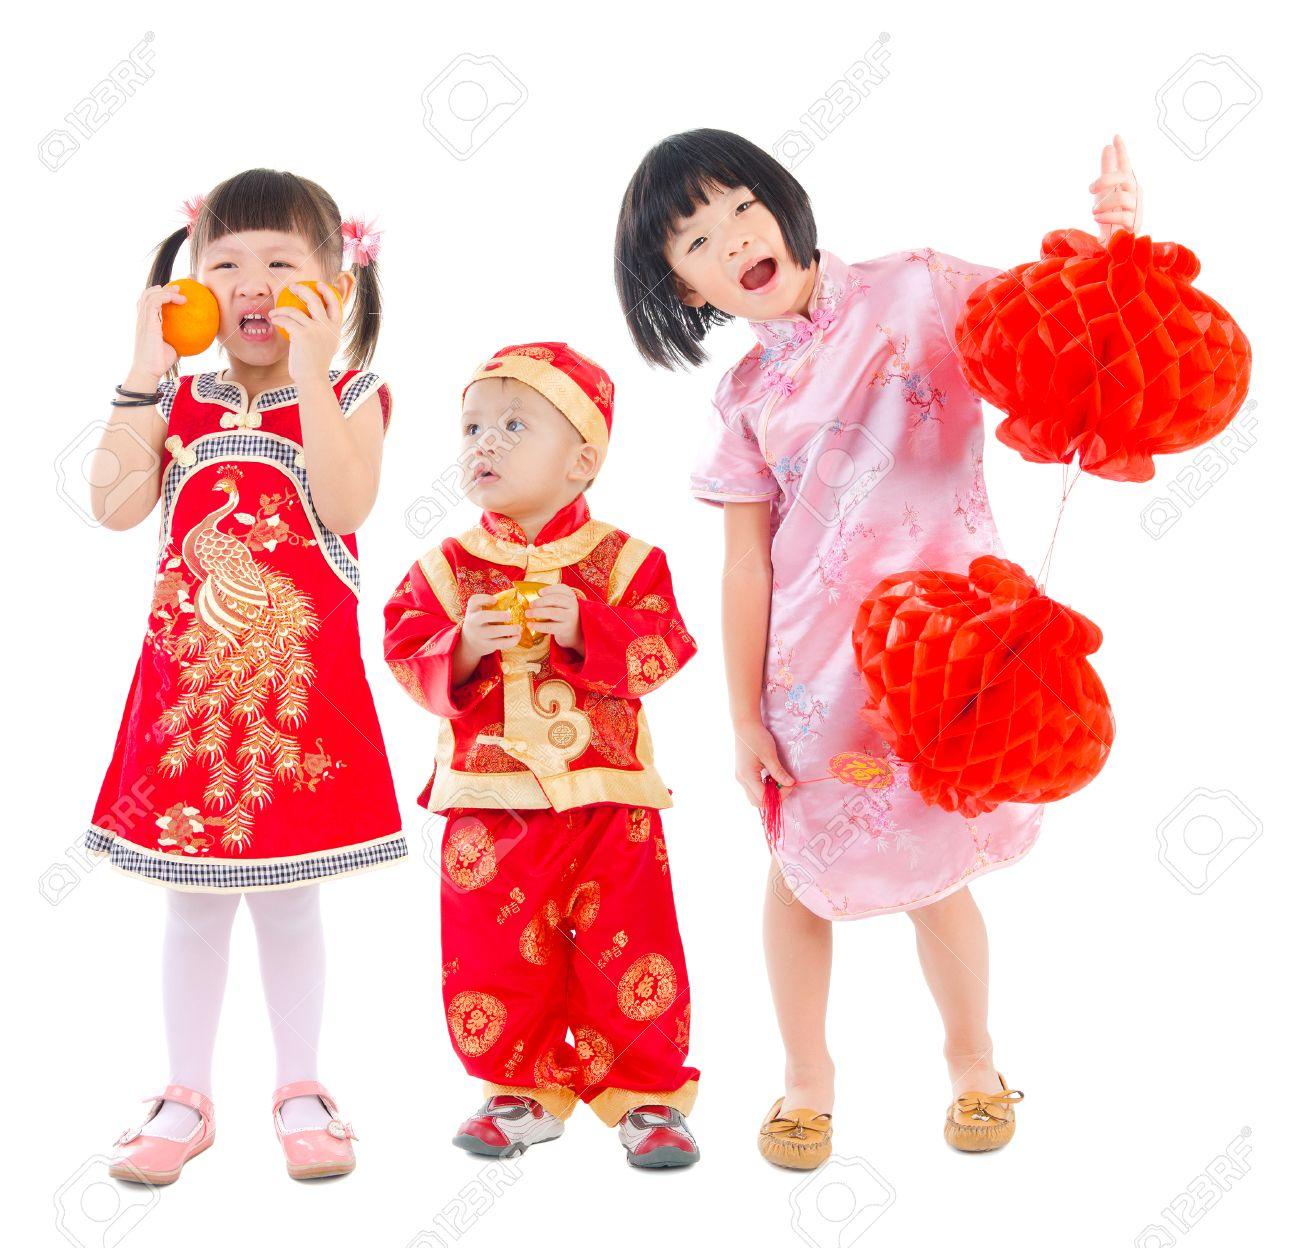 f3e937d30 Asian Kids In Traditional Chinese Costume Cheongsam Stock Photo - 44173839  Sc 1 St 123RF.com